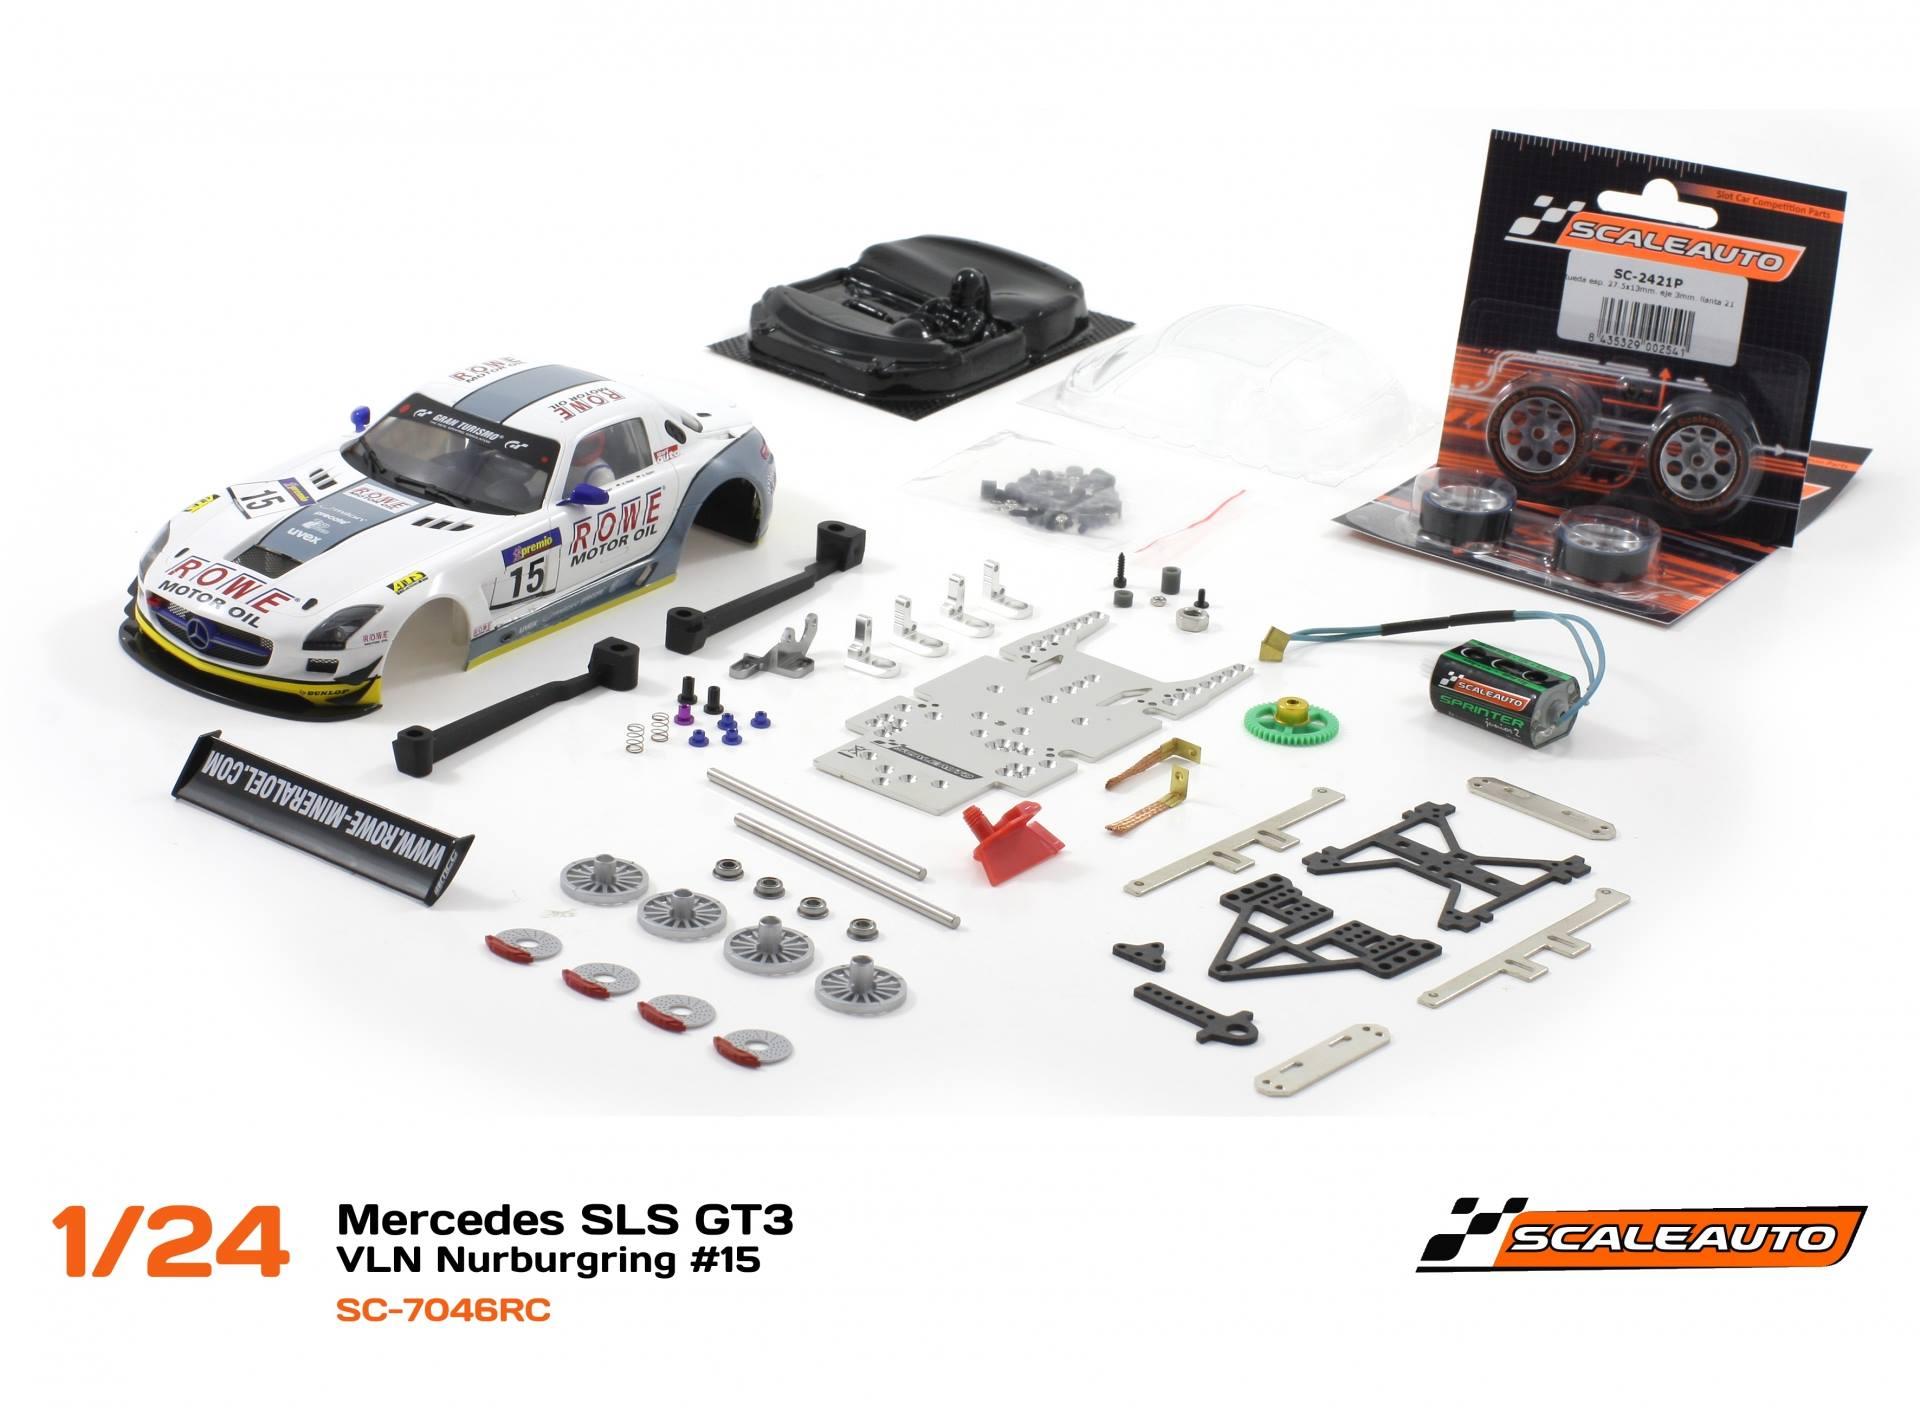 Mercedes SLS GT3 – VLN Nurburgring #15 – SC-7046RC